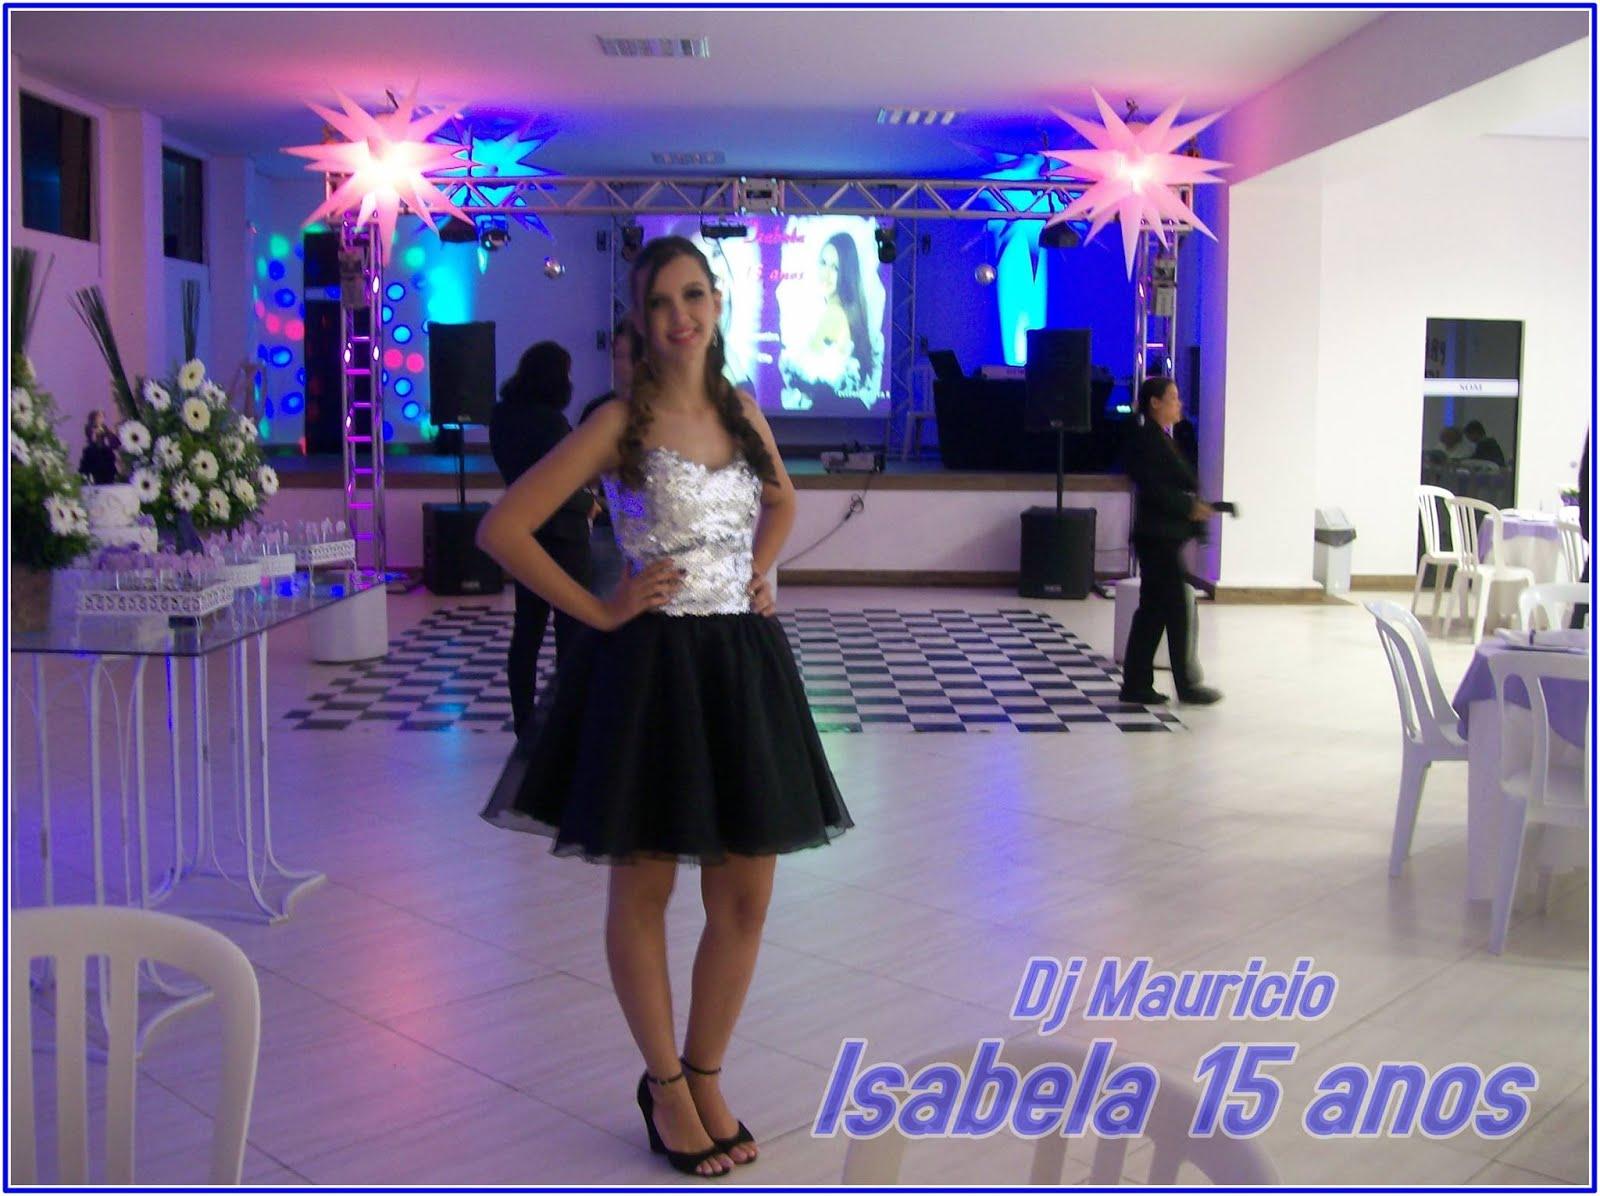 Isabéla 15 anos